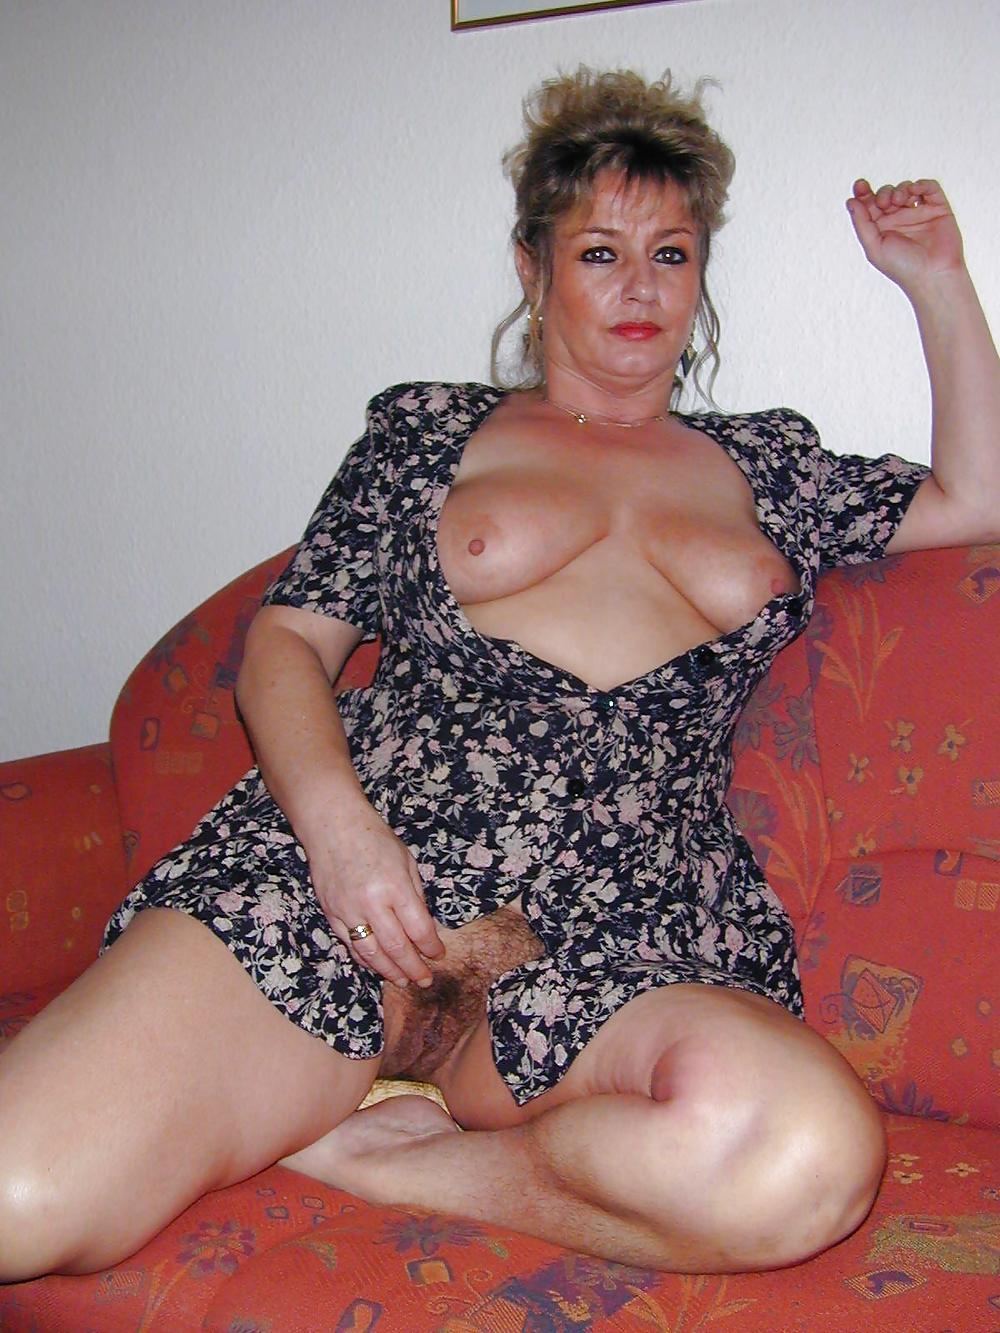 Bbw Matures Women Pictures Gallery 104